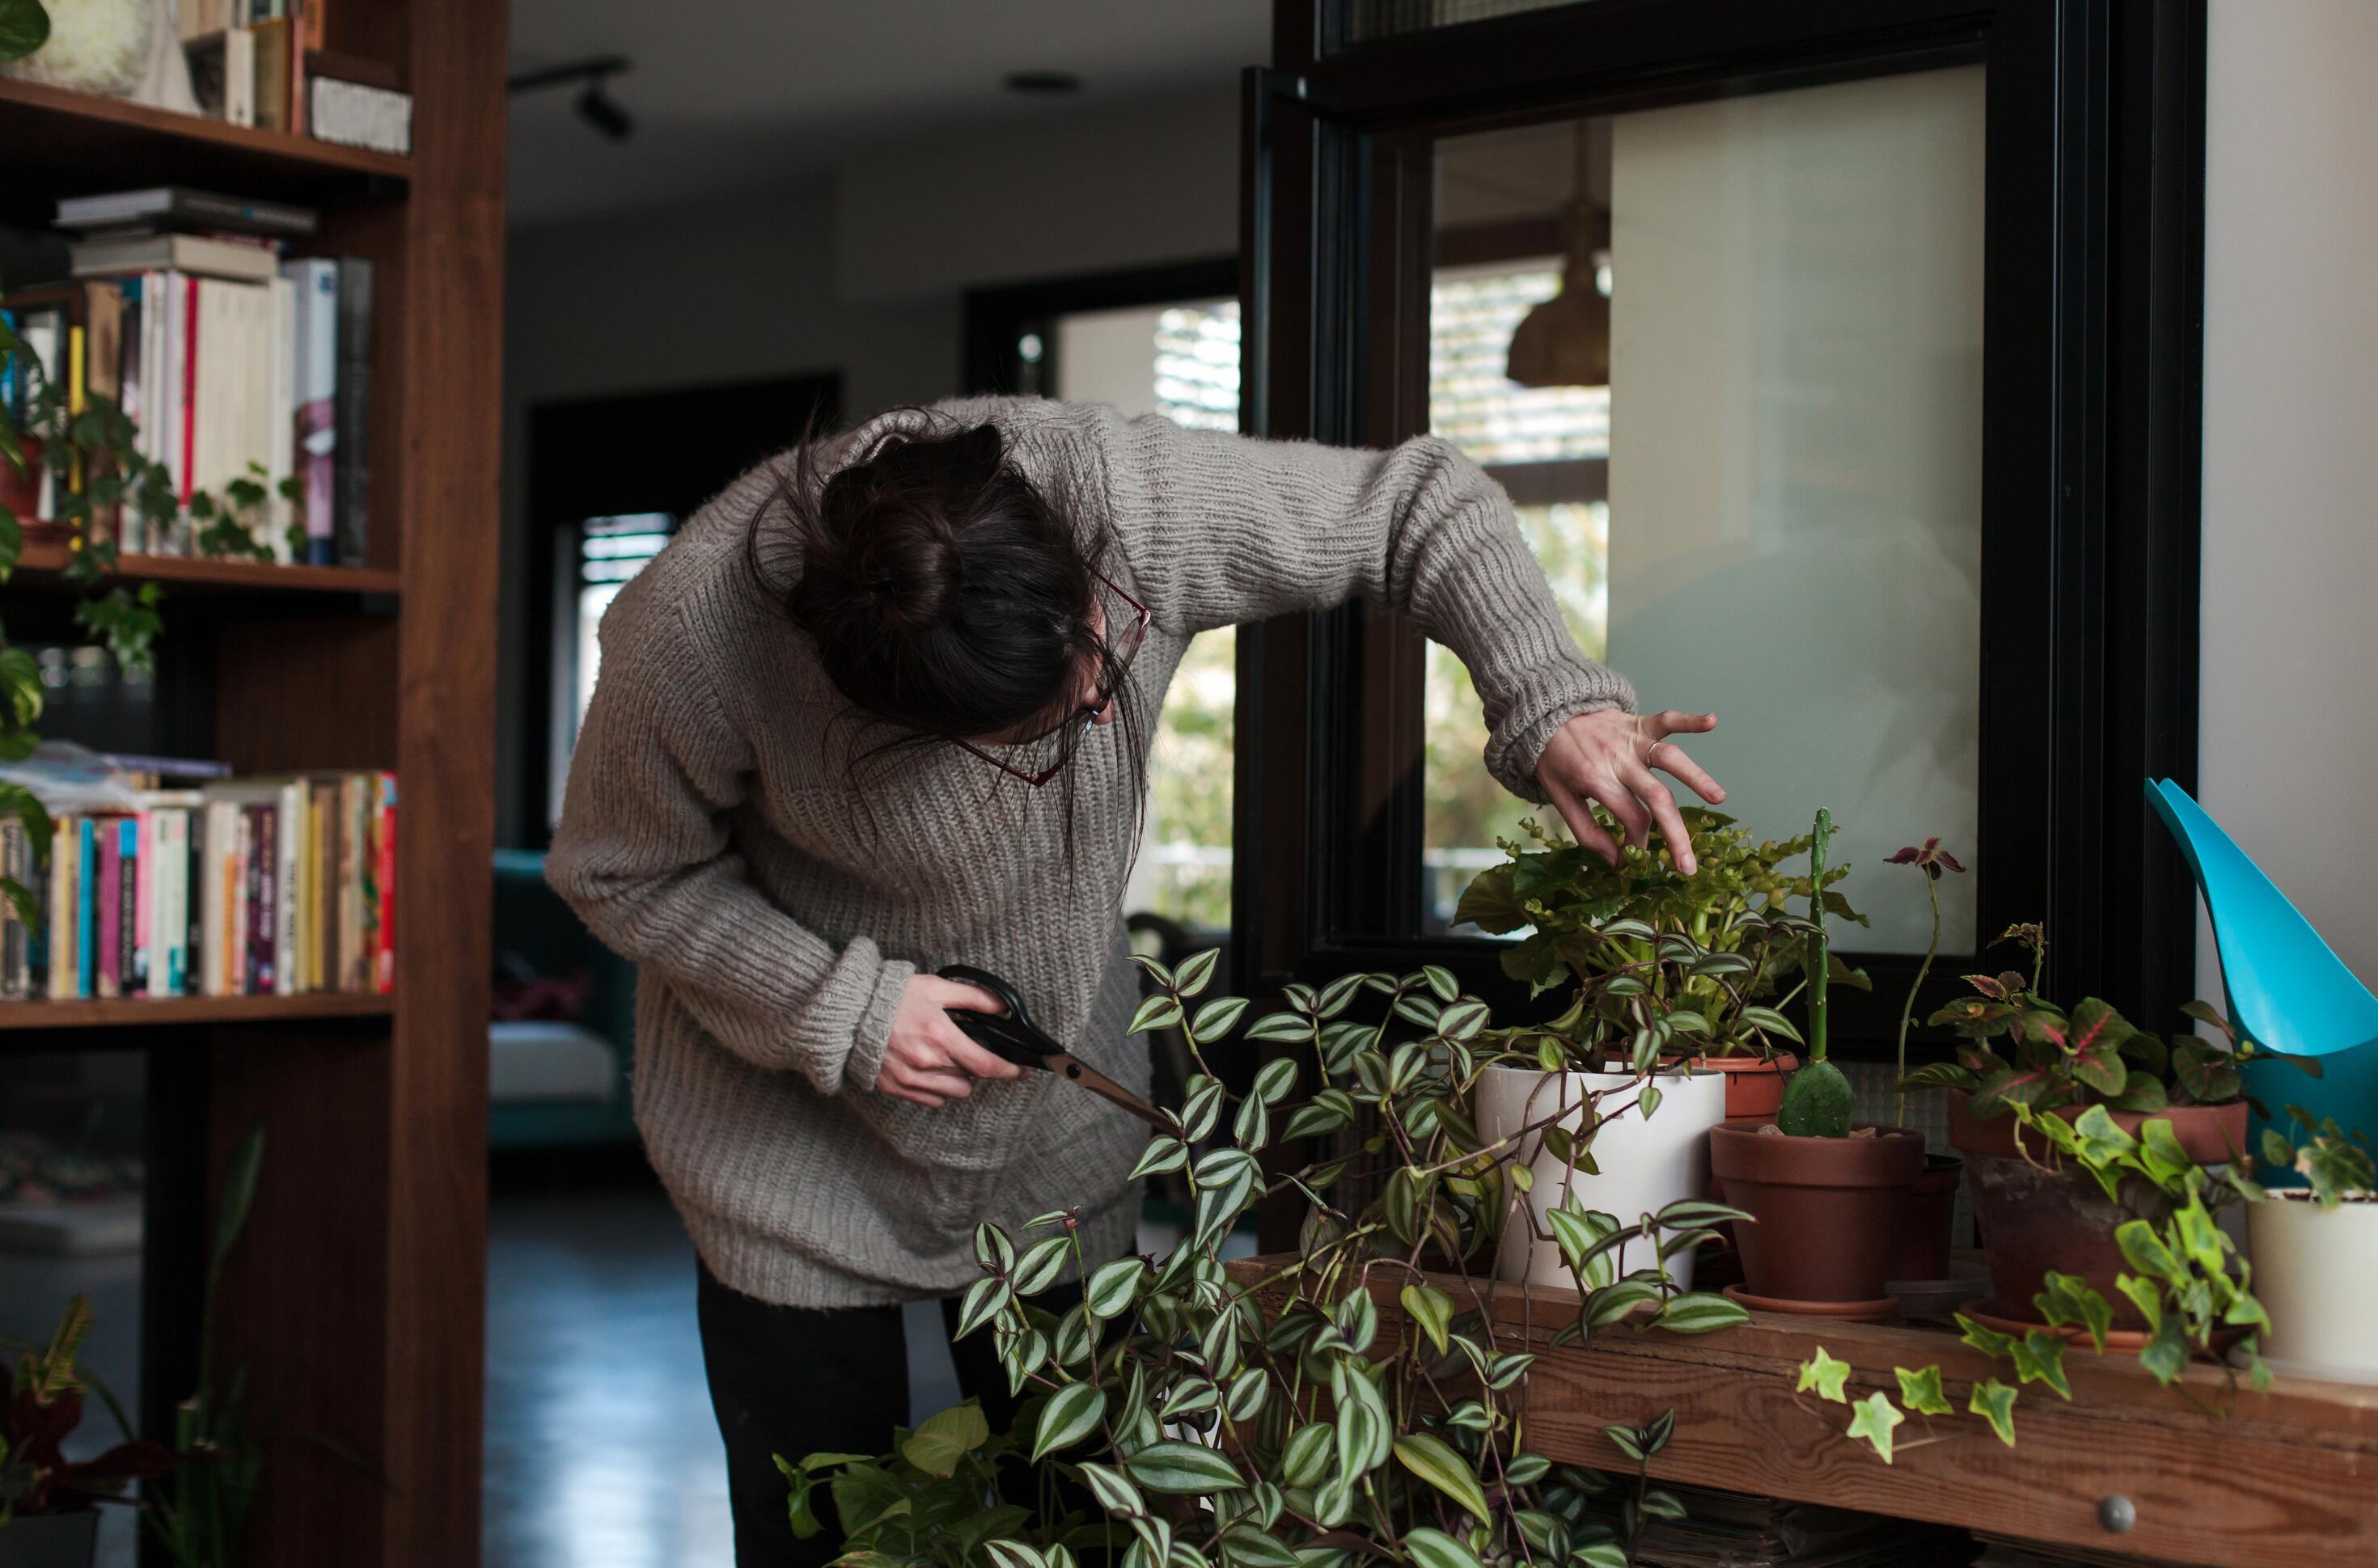 Woman's Pastime Plant Care